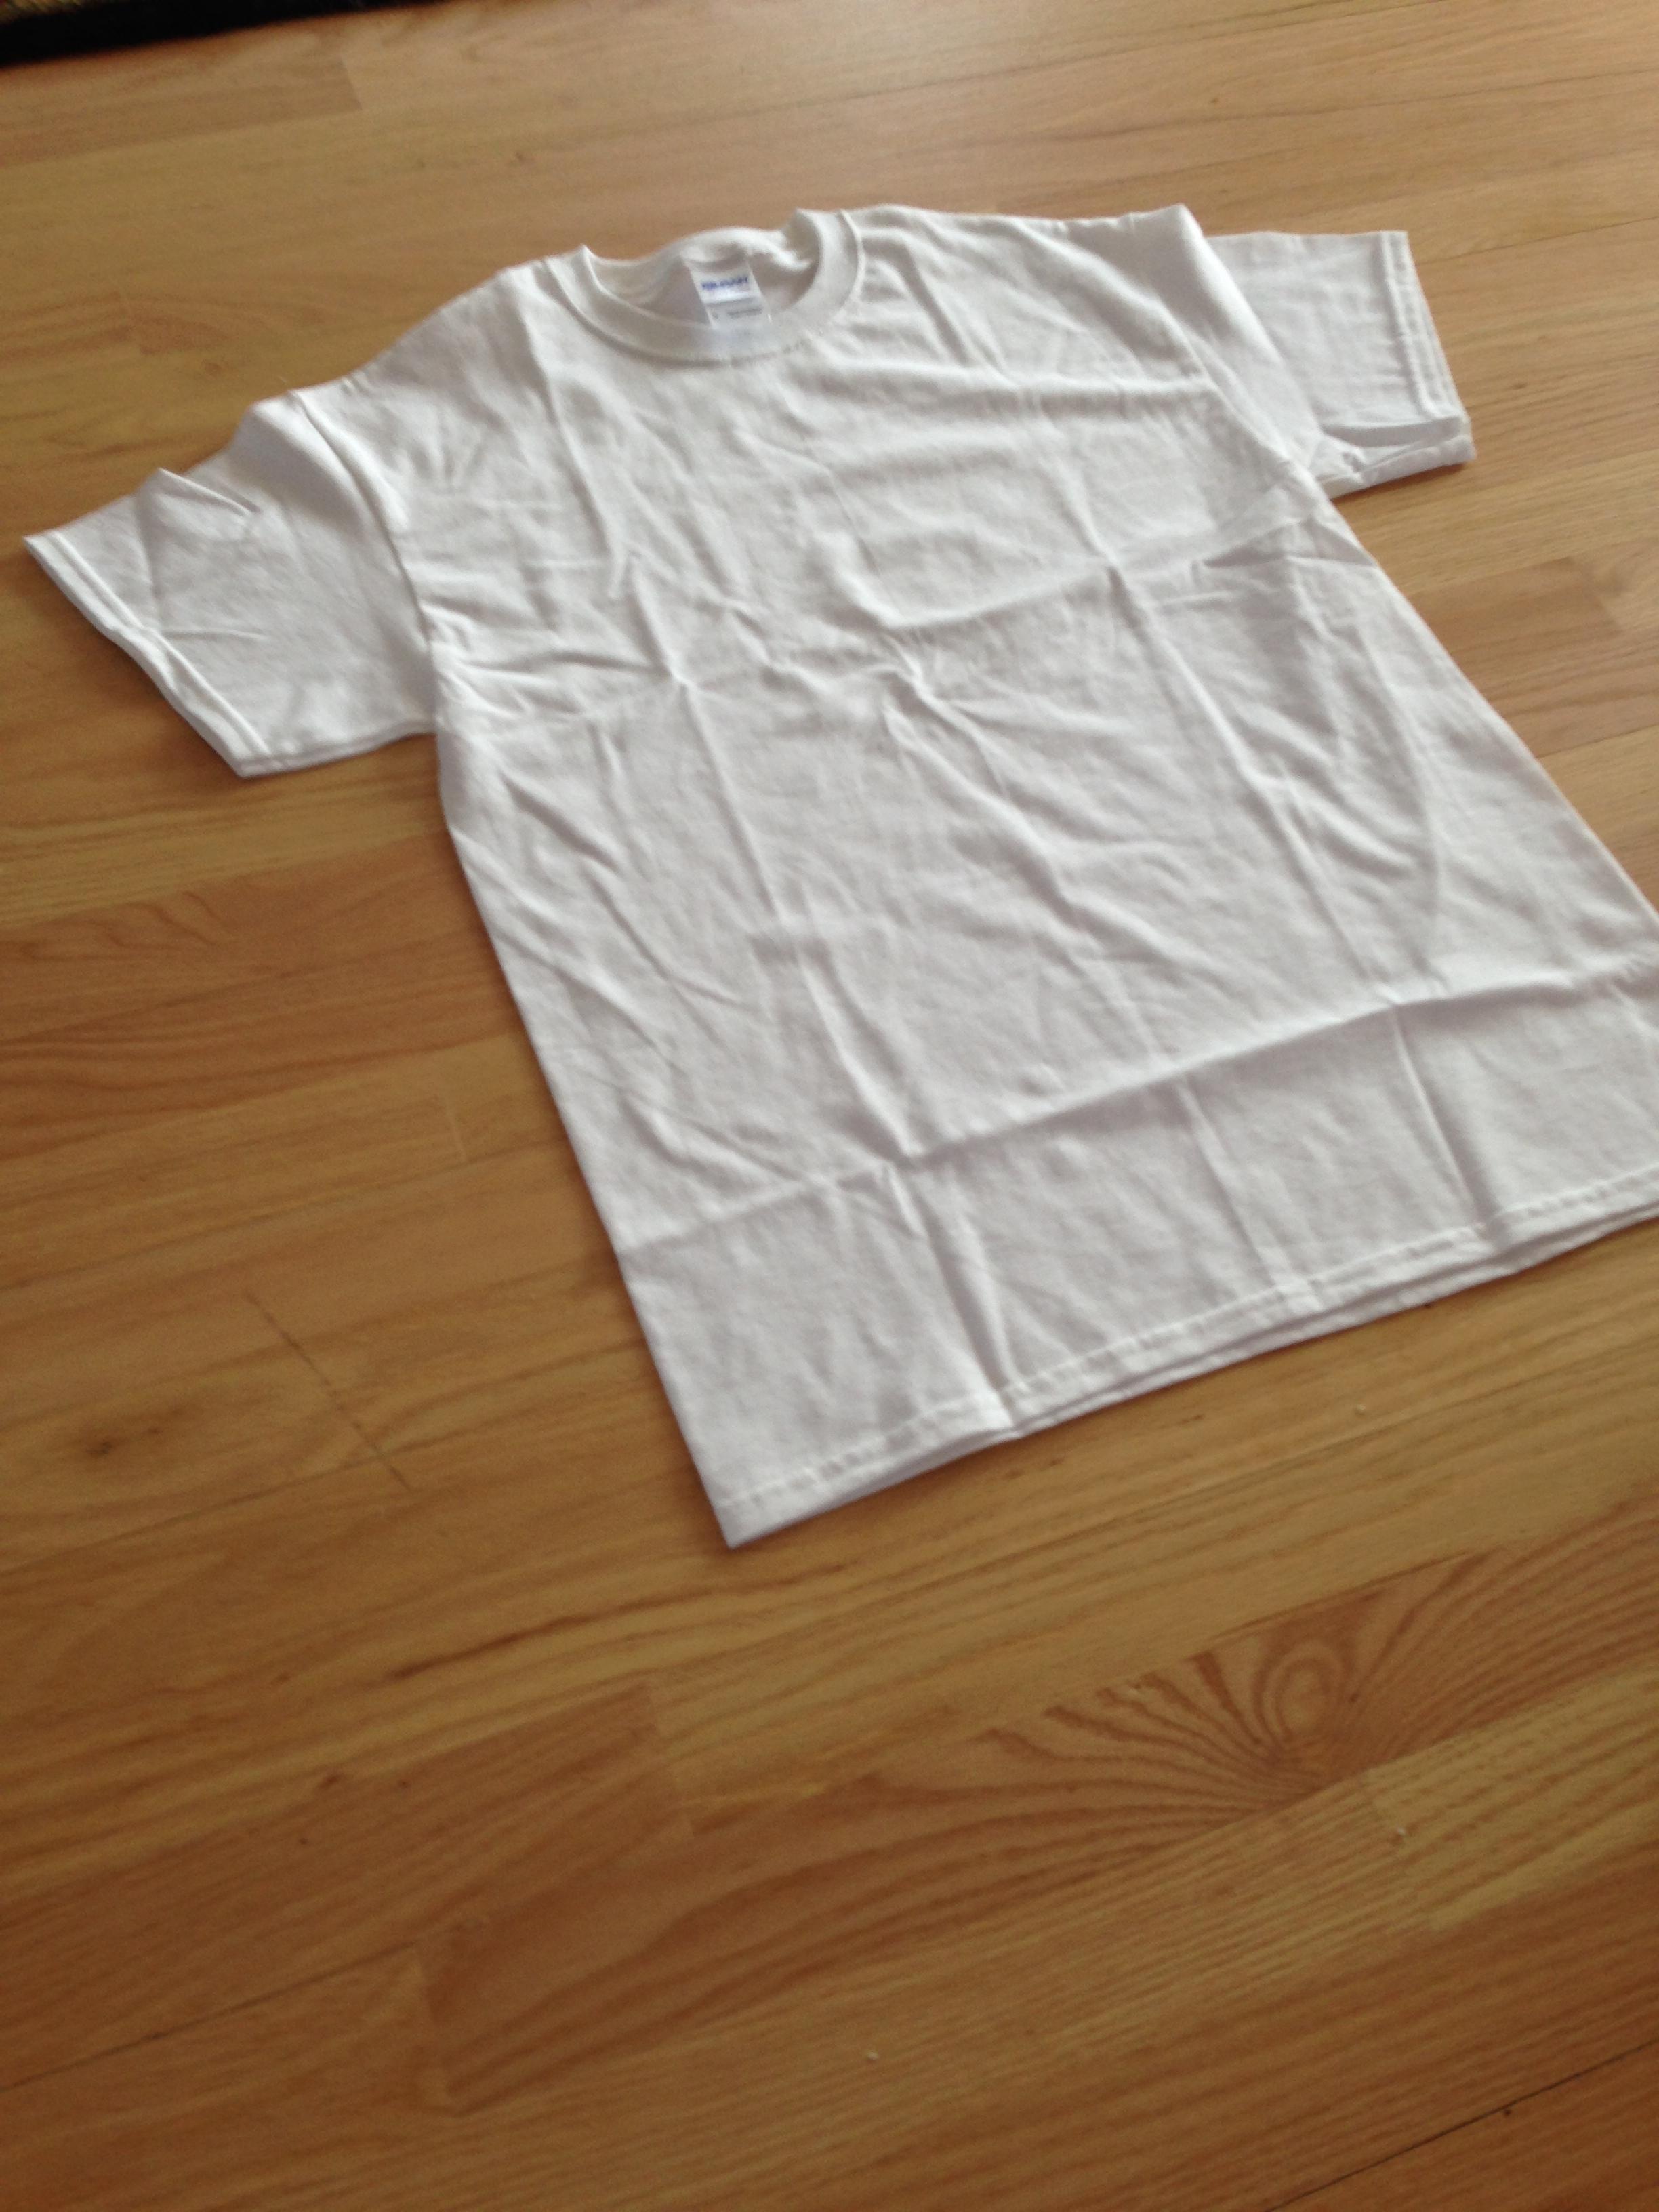 Diy T Shirt Design Ideas